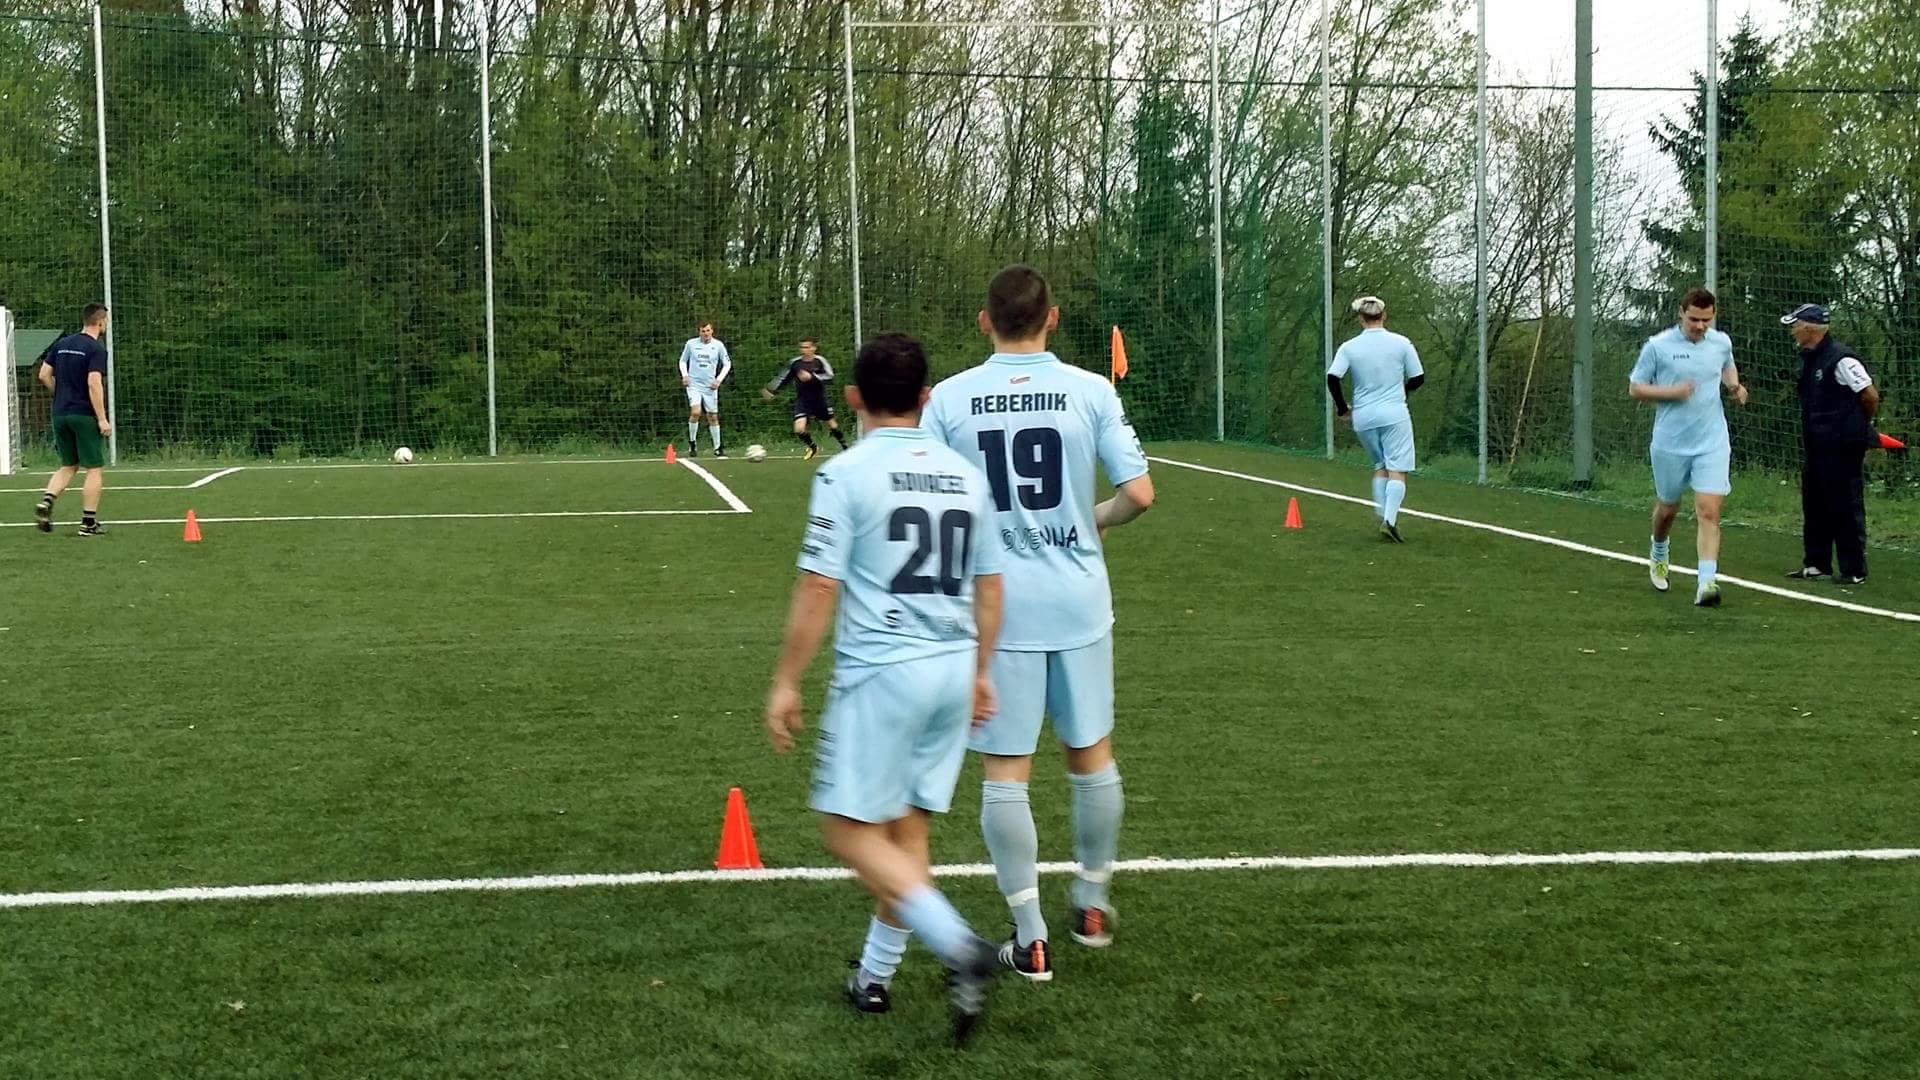 reprezentanca_trening_vidonci_april_1